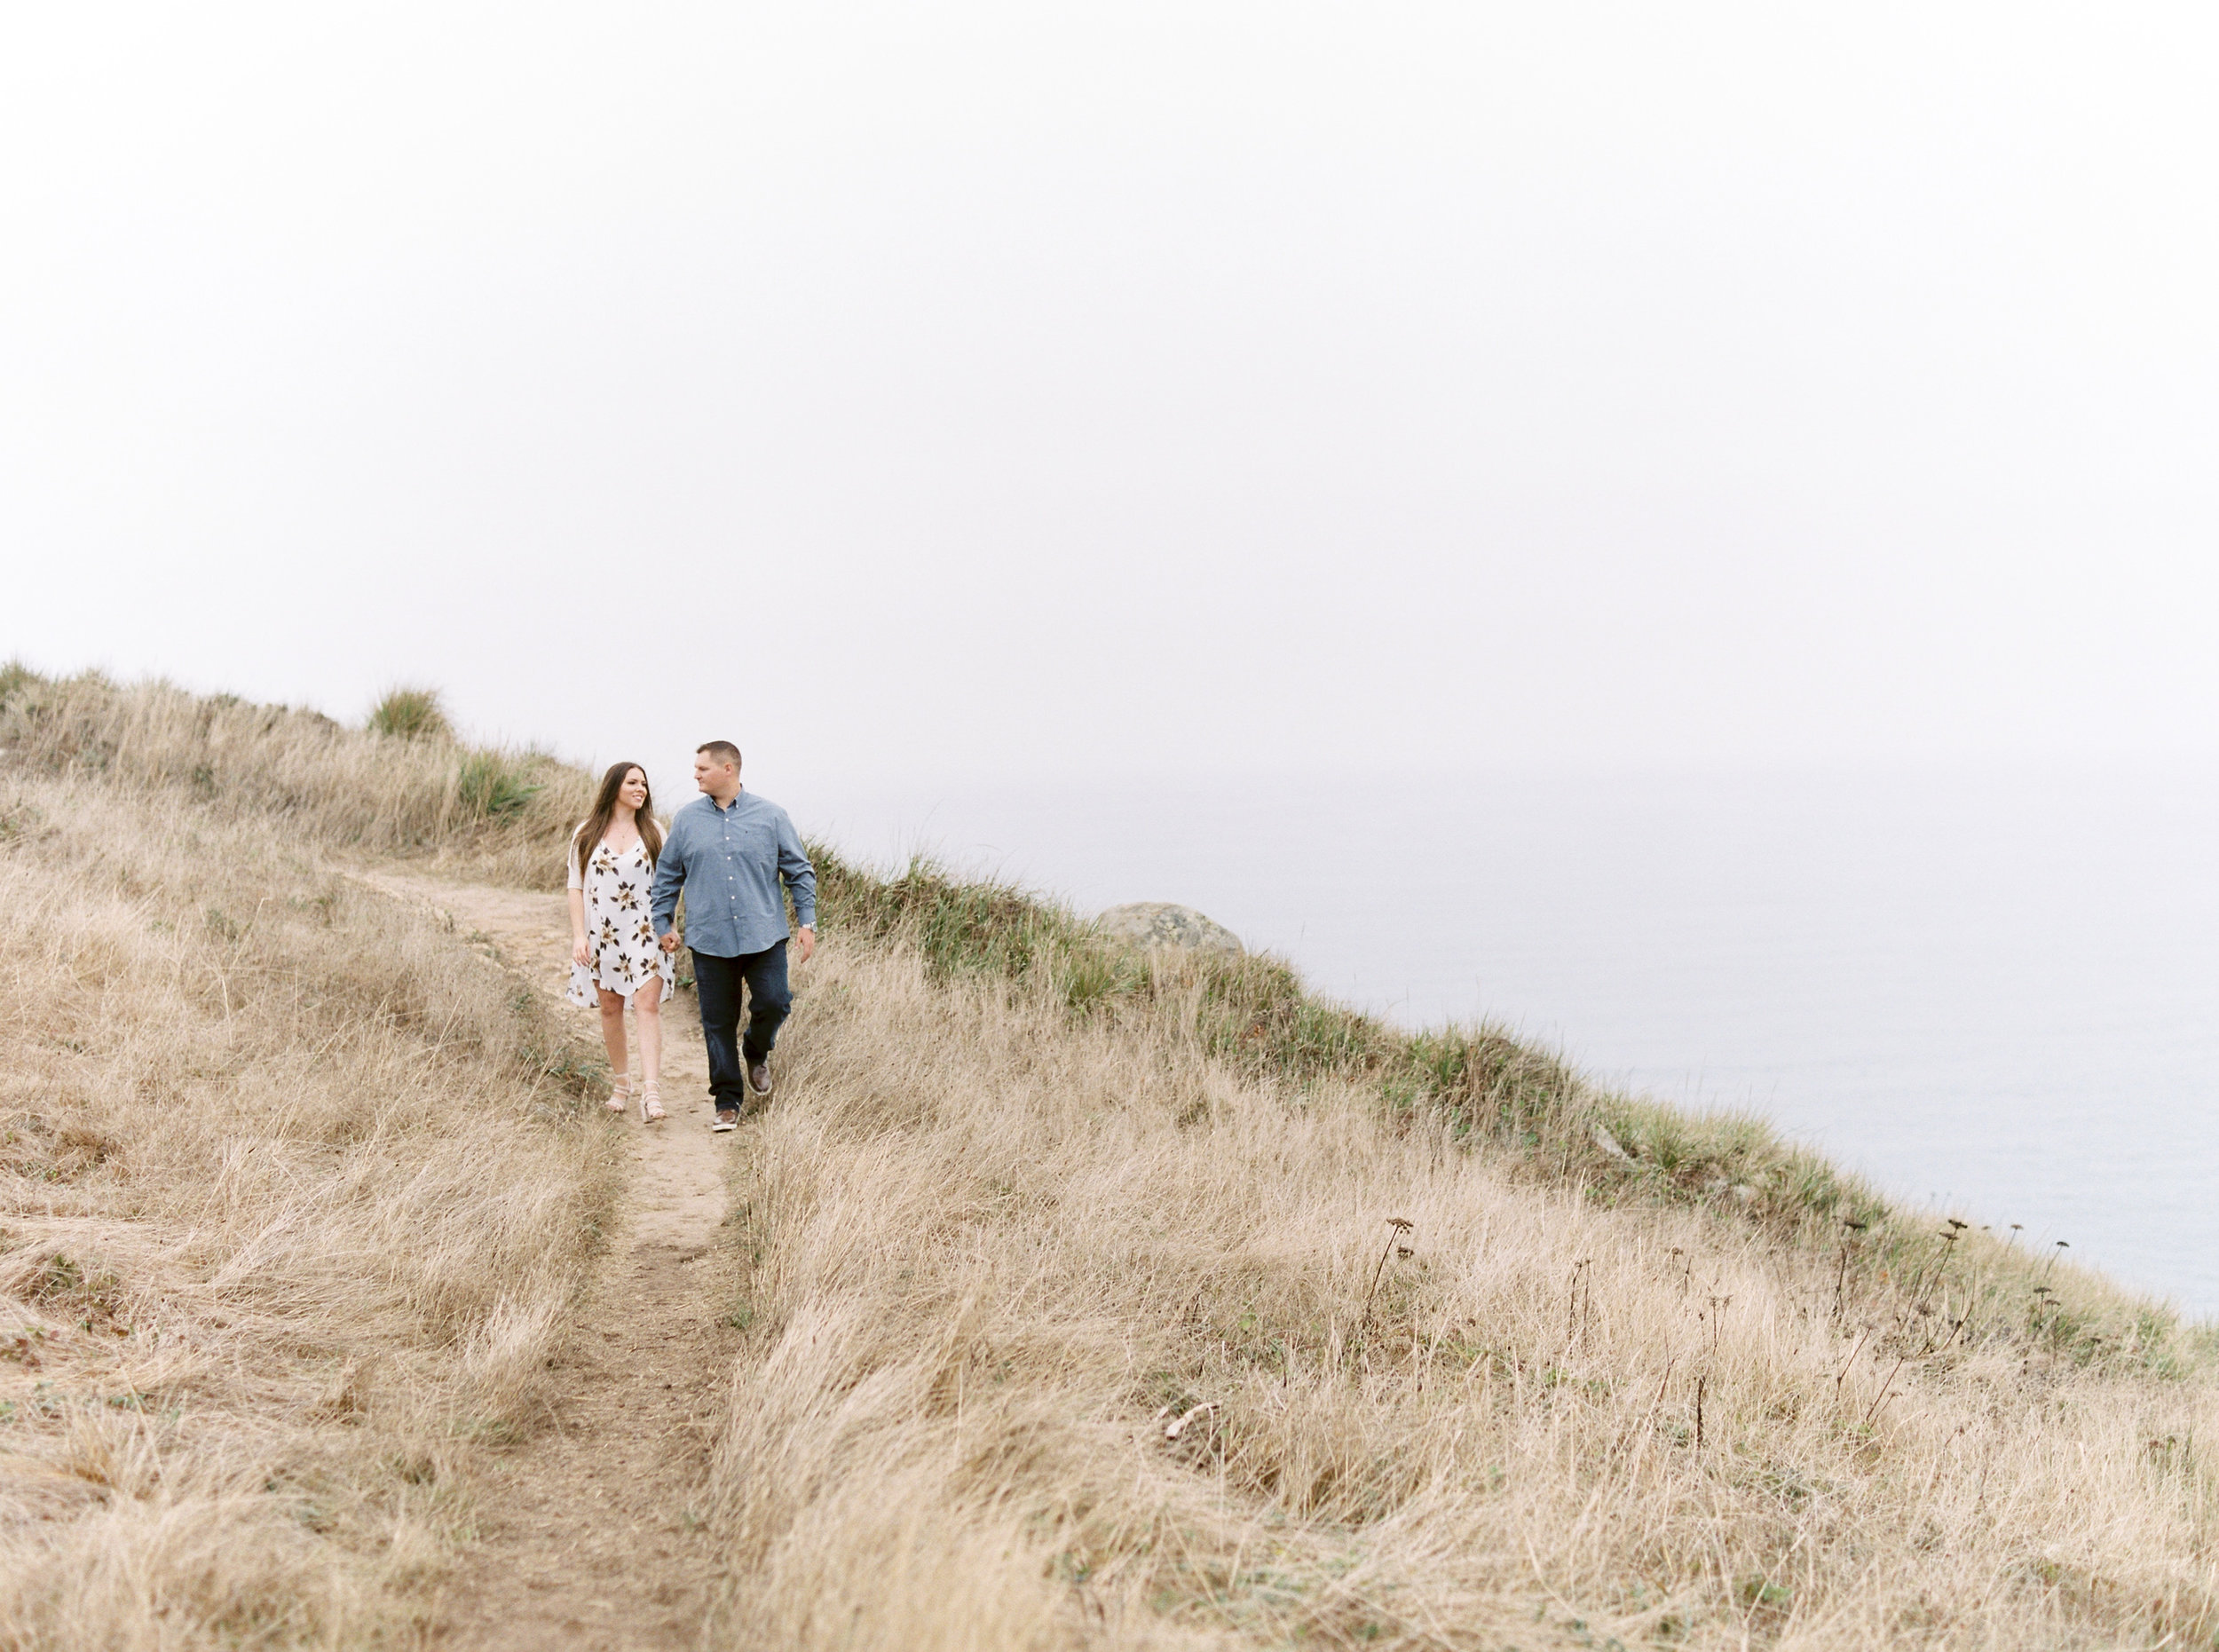 Point-reyes-california-engagement-photographer-15.jpg